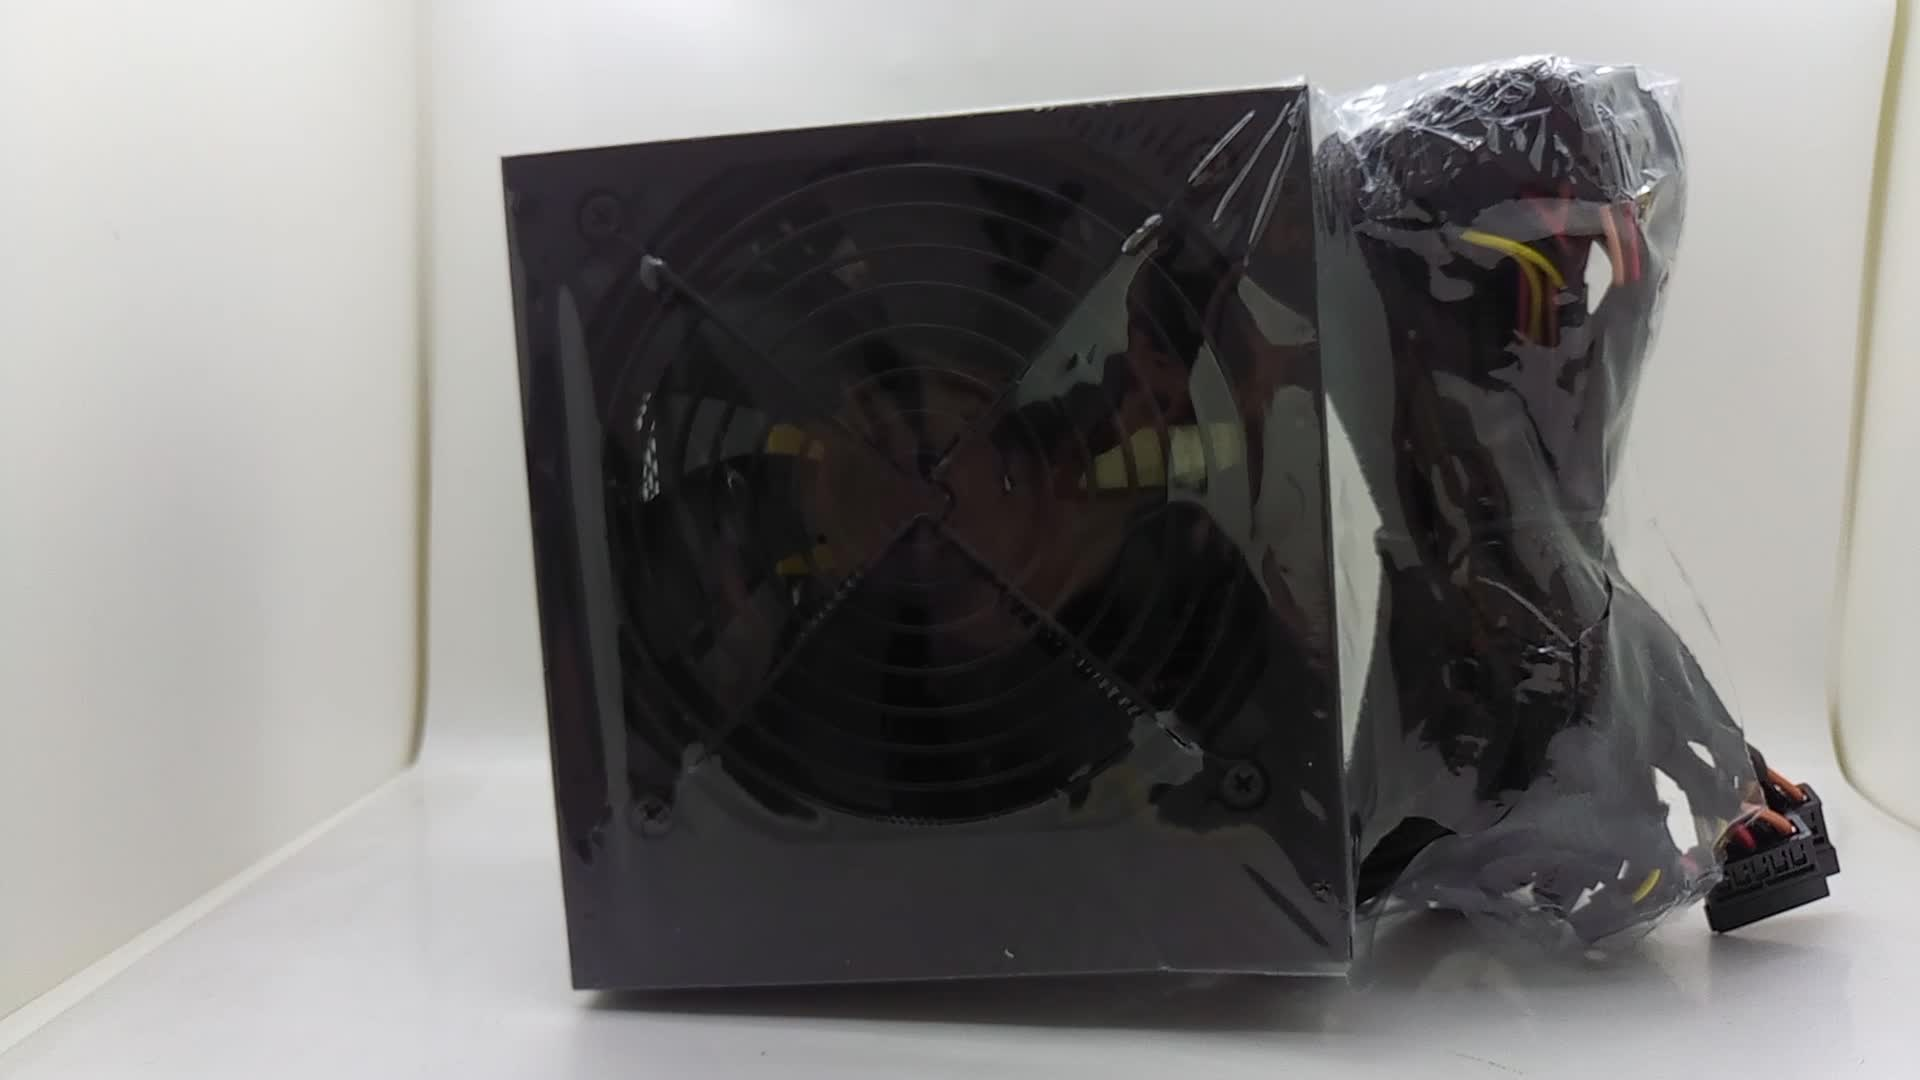 China supplier wide voltage server case switch power supply